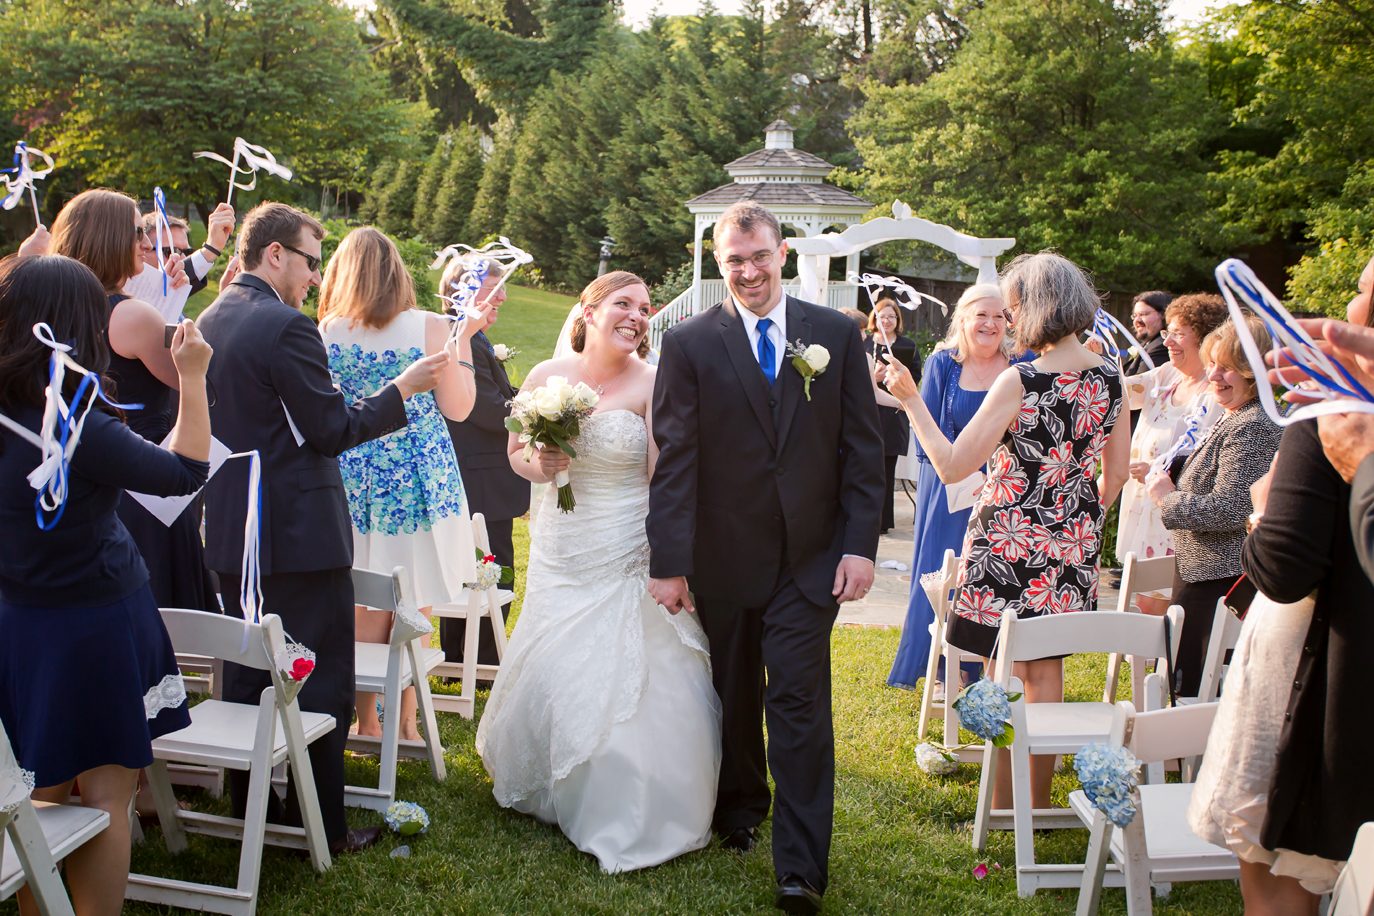 Another great day to work outdoors. #bride #groom #weddingceremony #weddingaltar #weddinginspiration #weddingplanner #weddingday #weddingstyle #weddingvibes #weddinggown #weddingparty #weddings #weddingdress #weddingphotography